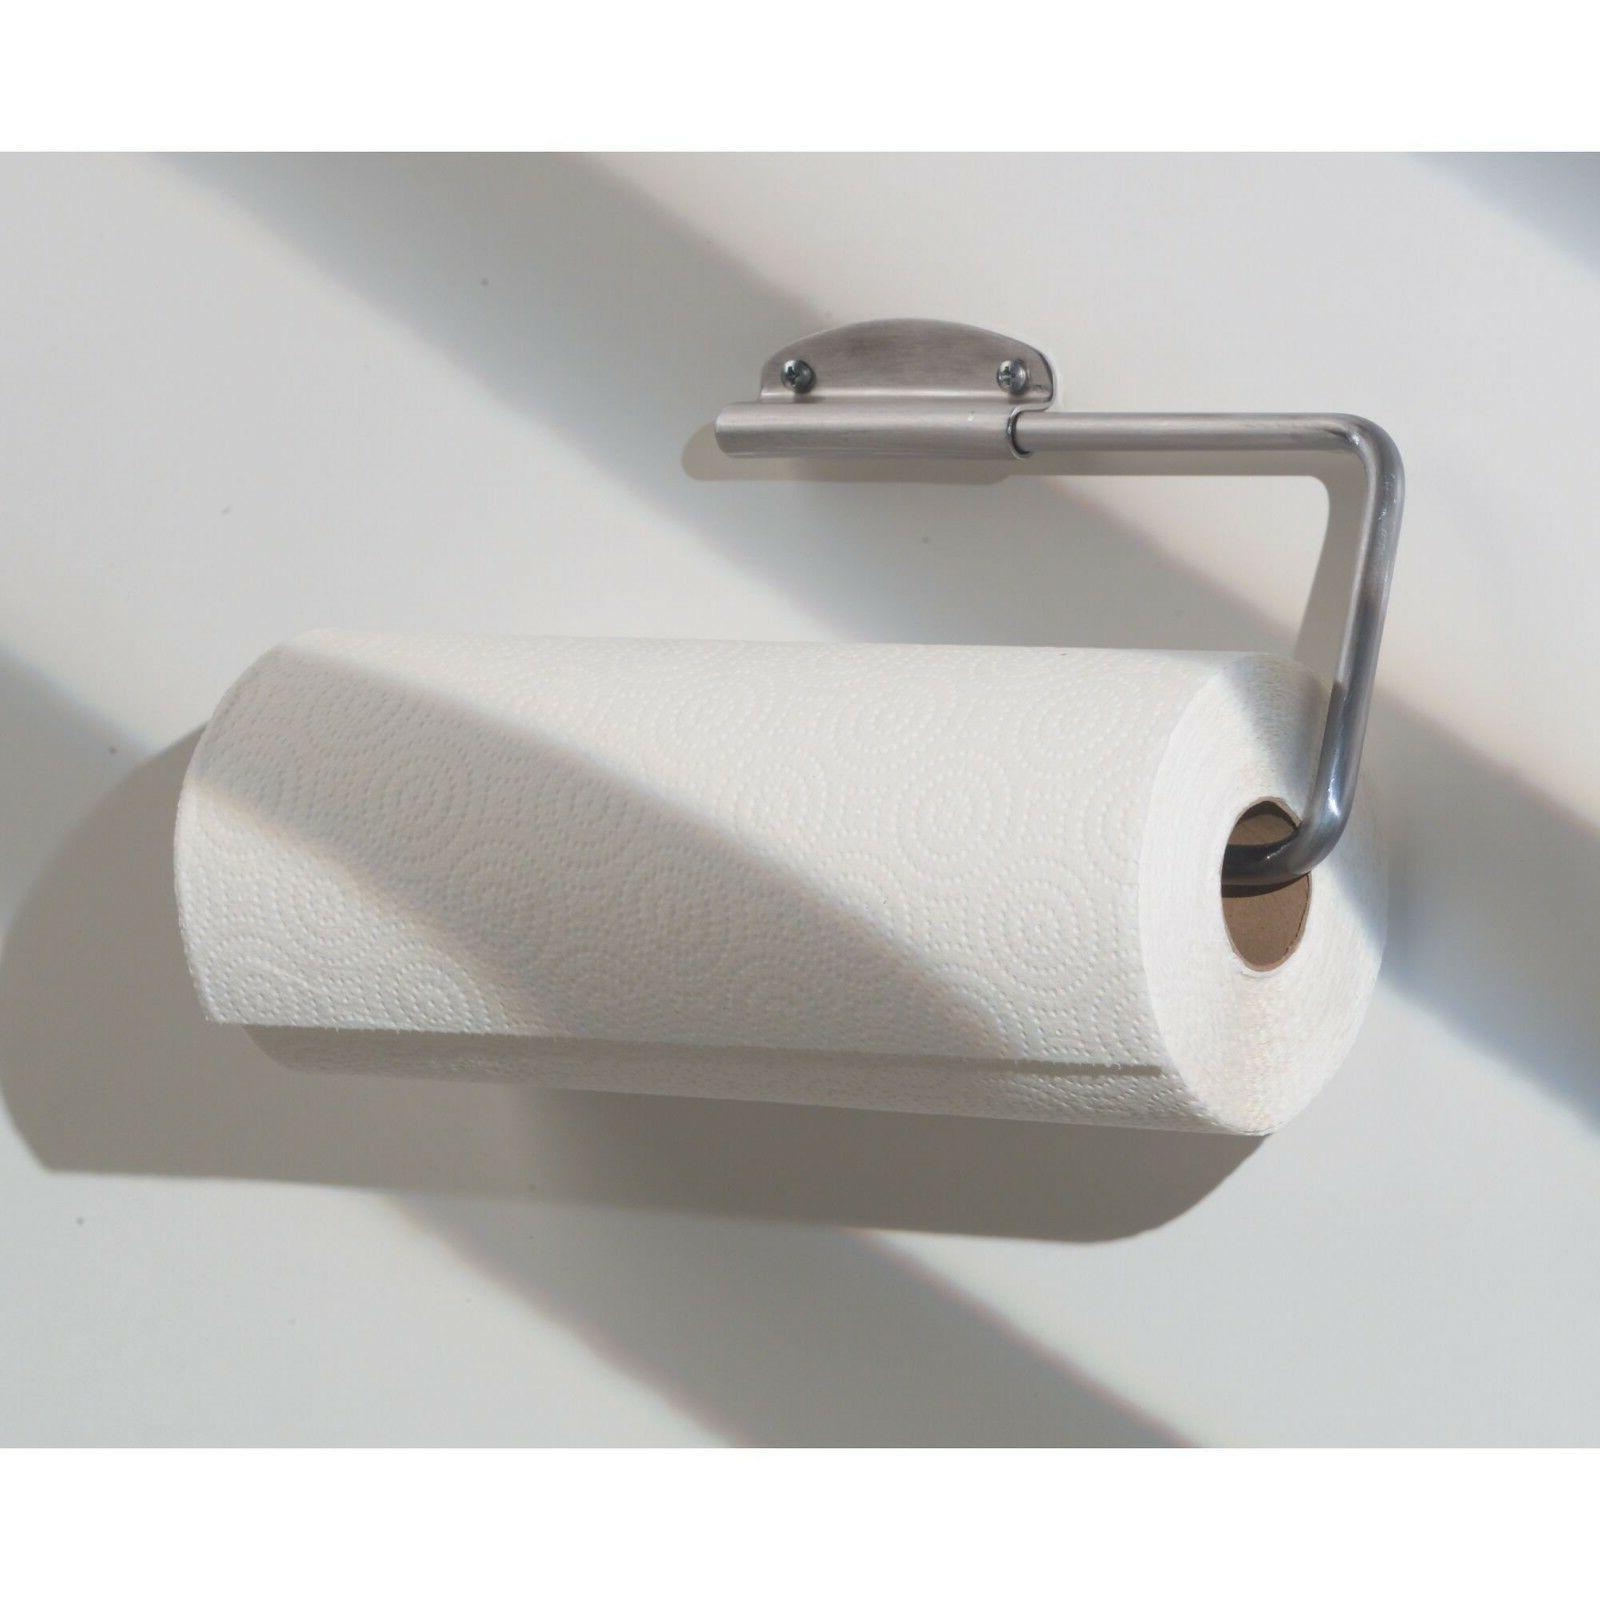 InterDesign Swivel Towel Holder Mount/Under Cabinet